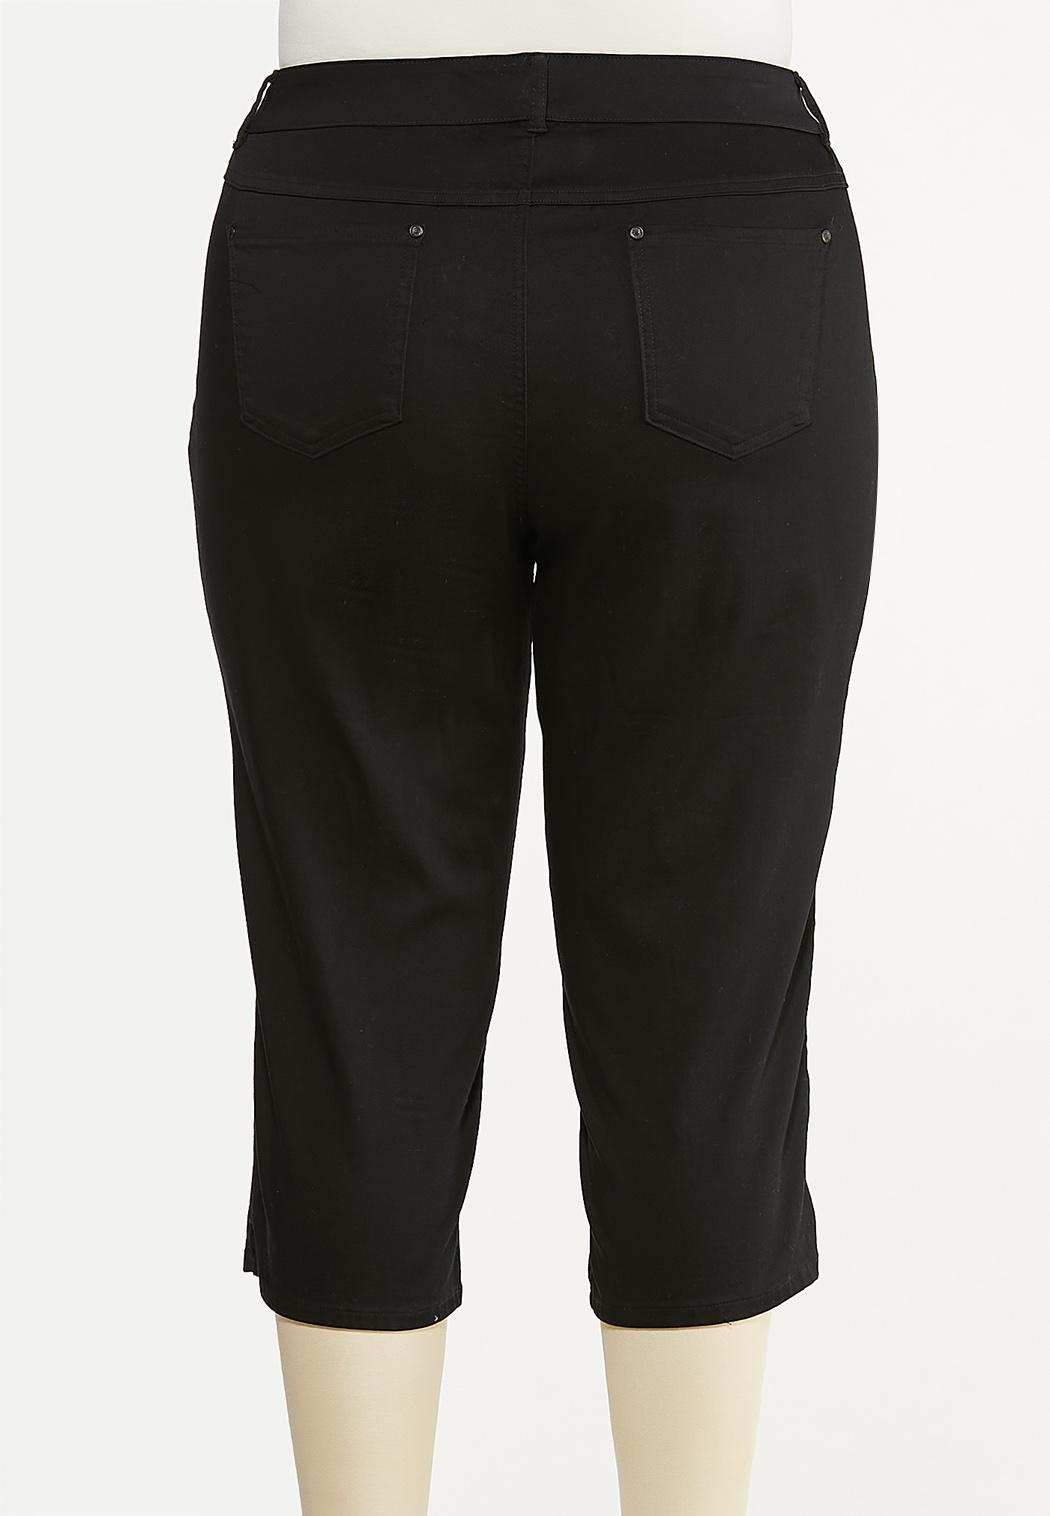 Plus Size Cropped Black Jeans (Item #44508366)